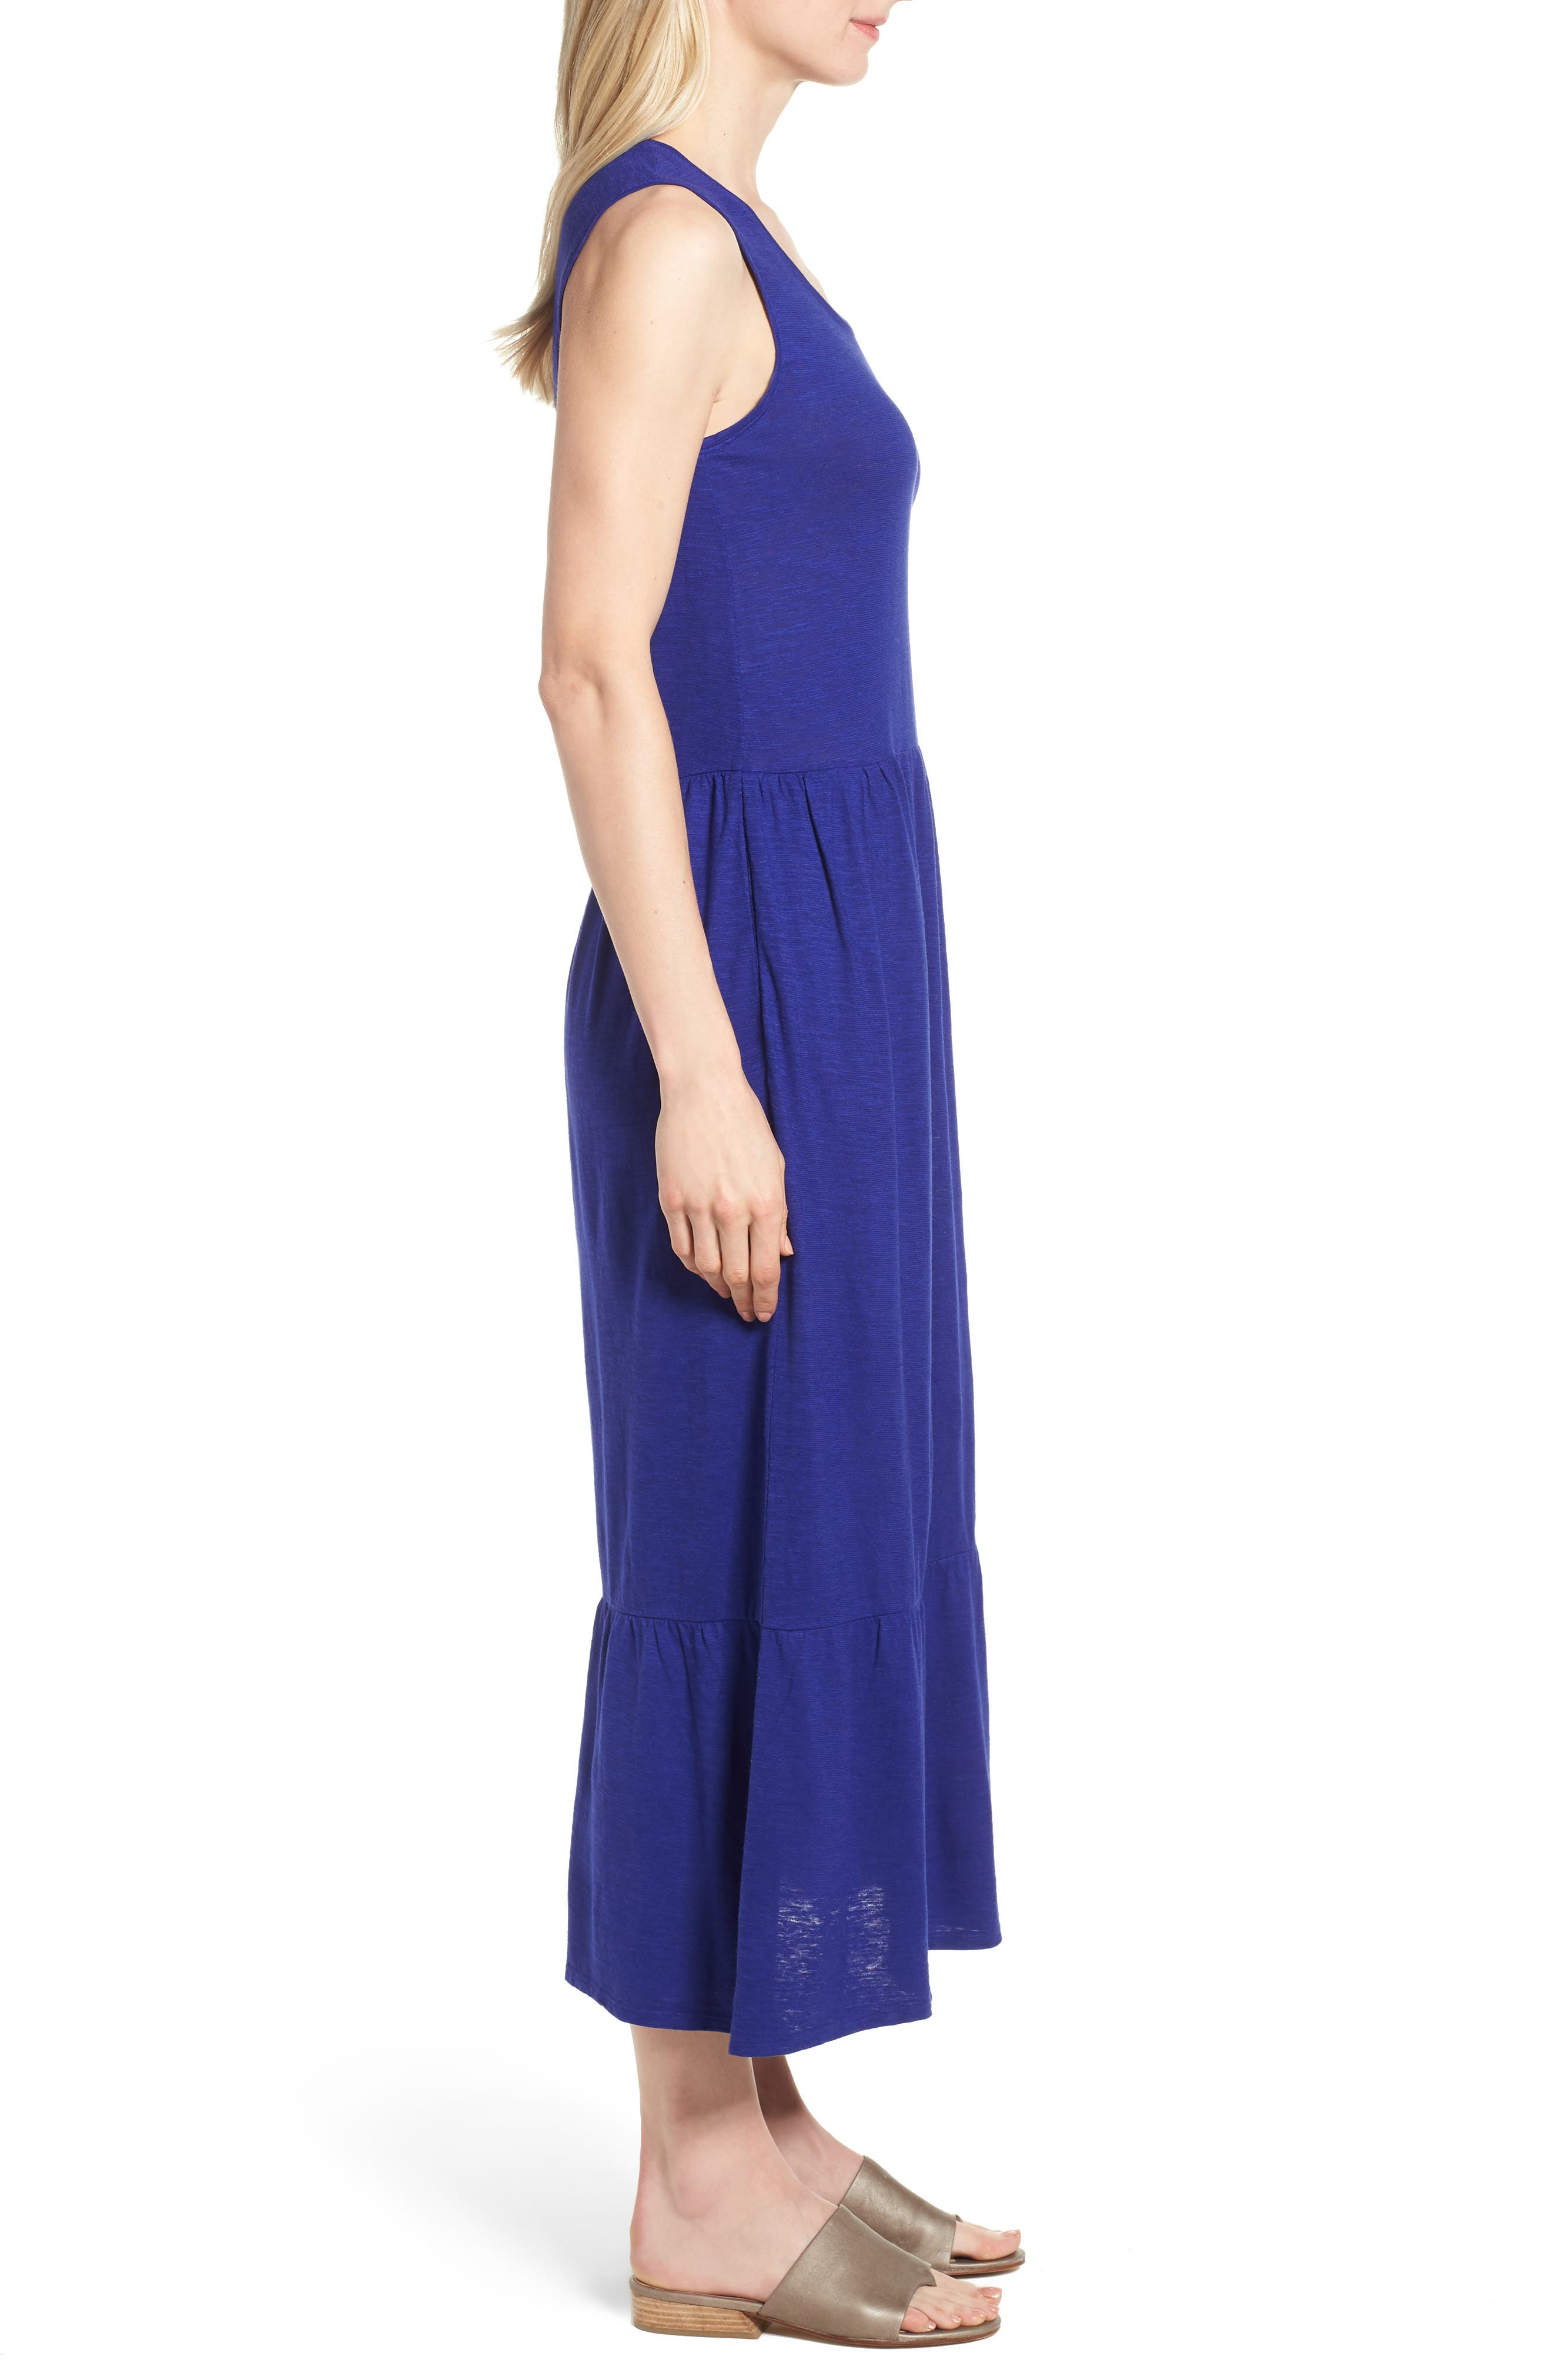 Scooped Neck Hemp & Cotton Midi Dress,                             Alternate thumbnail 3, color,                             Blue Violet